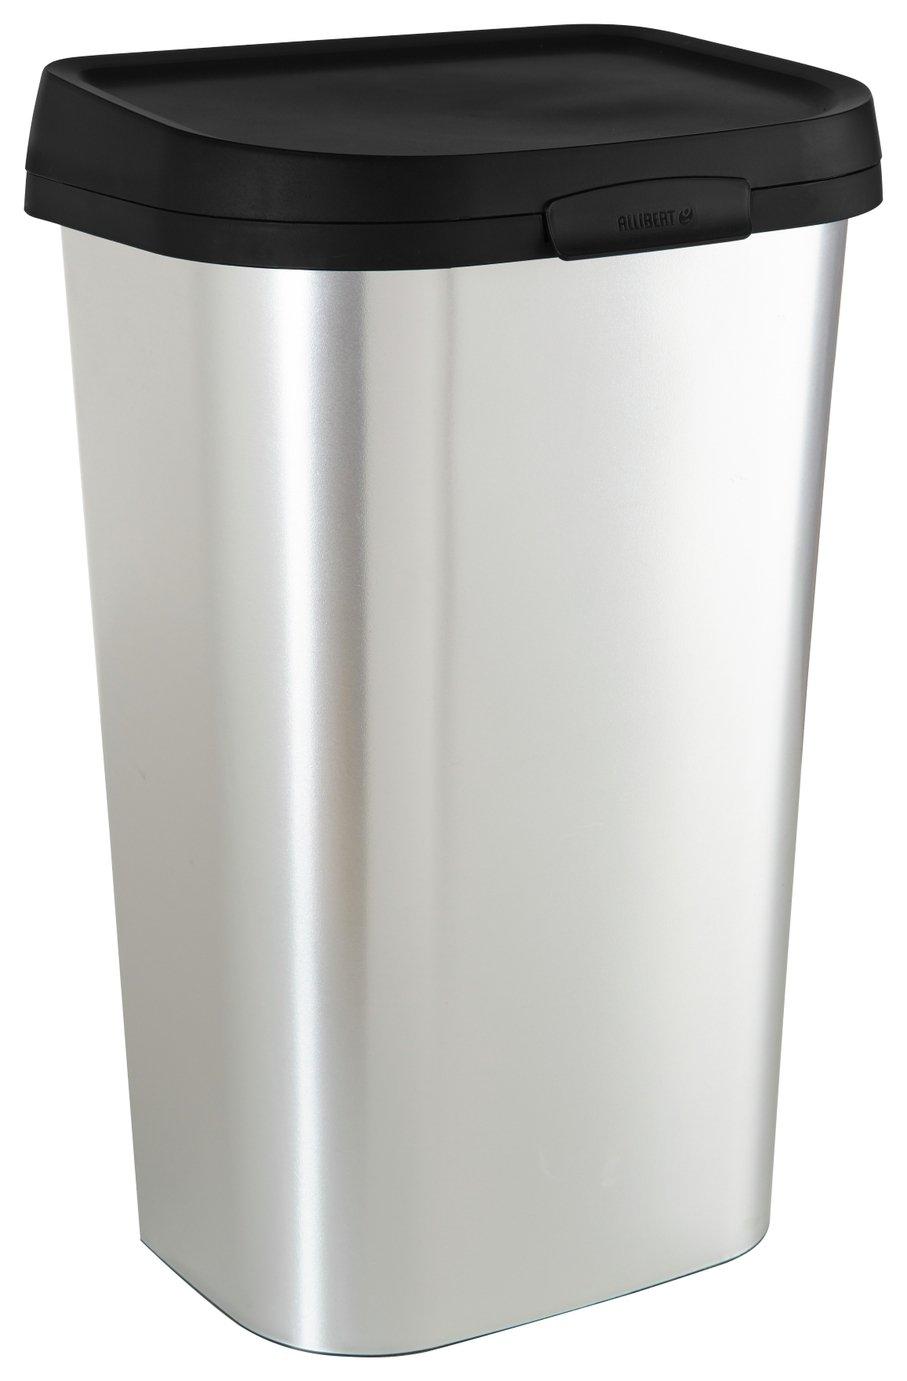 Curver Mistral 50 Litre Lift Top Bin - Silver